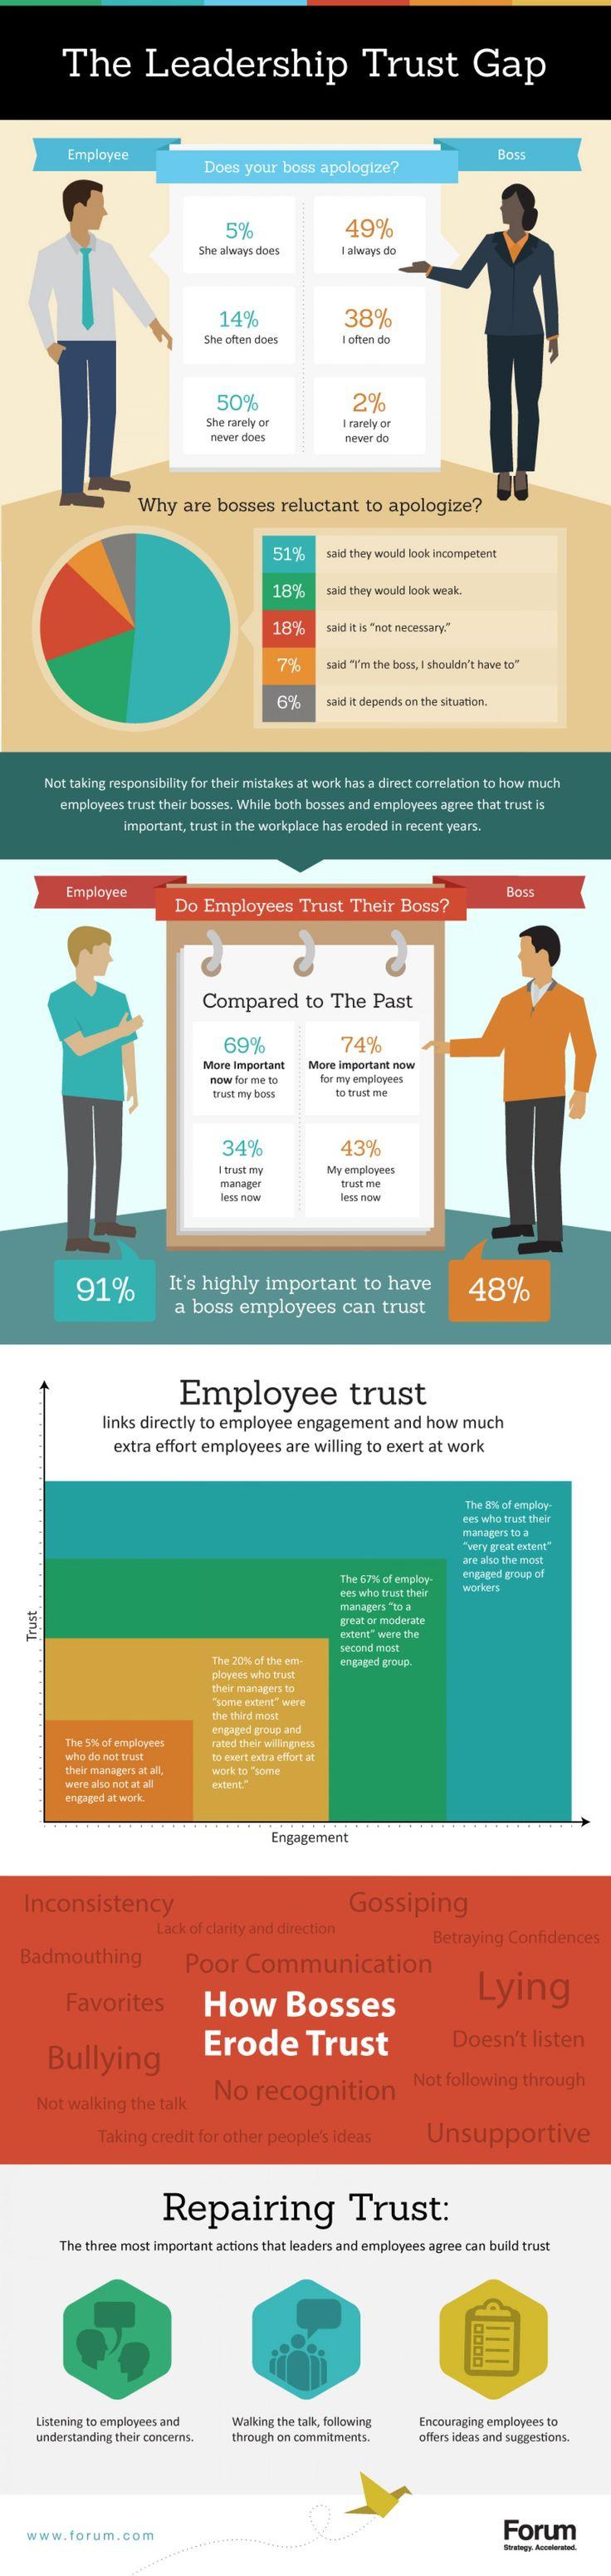 The Leadership Trust Gap